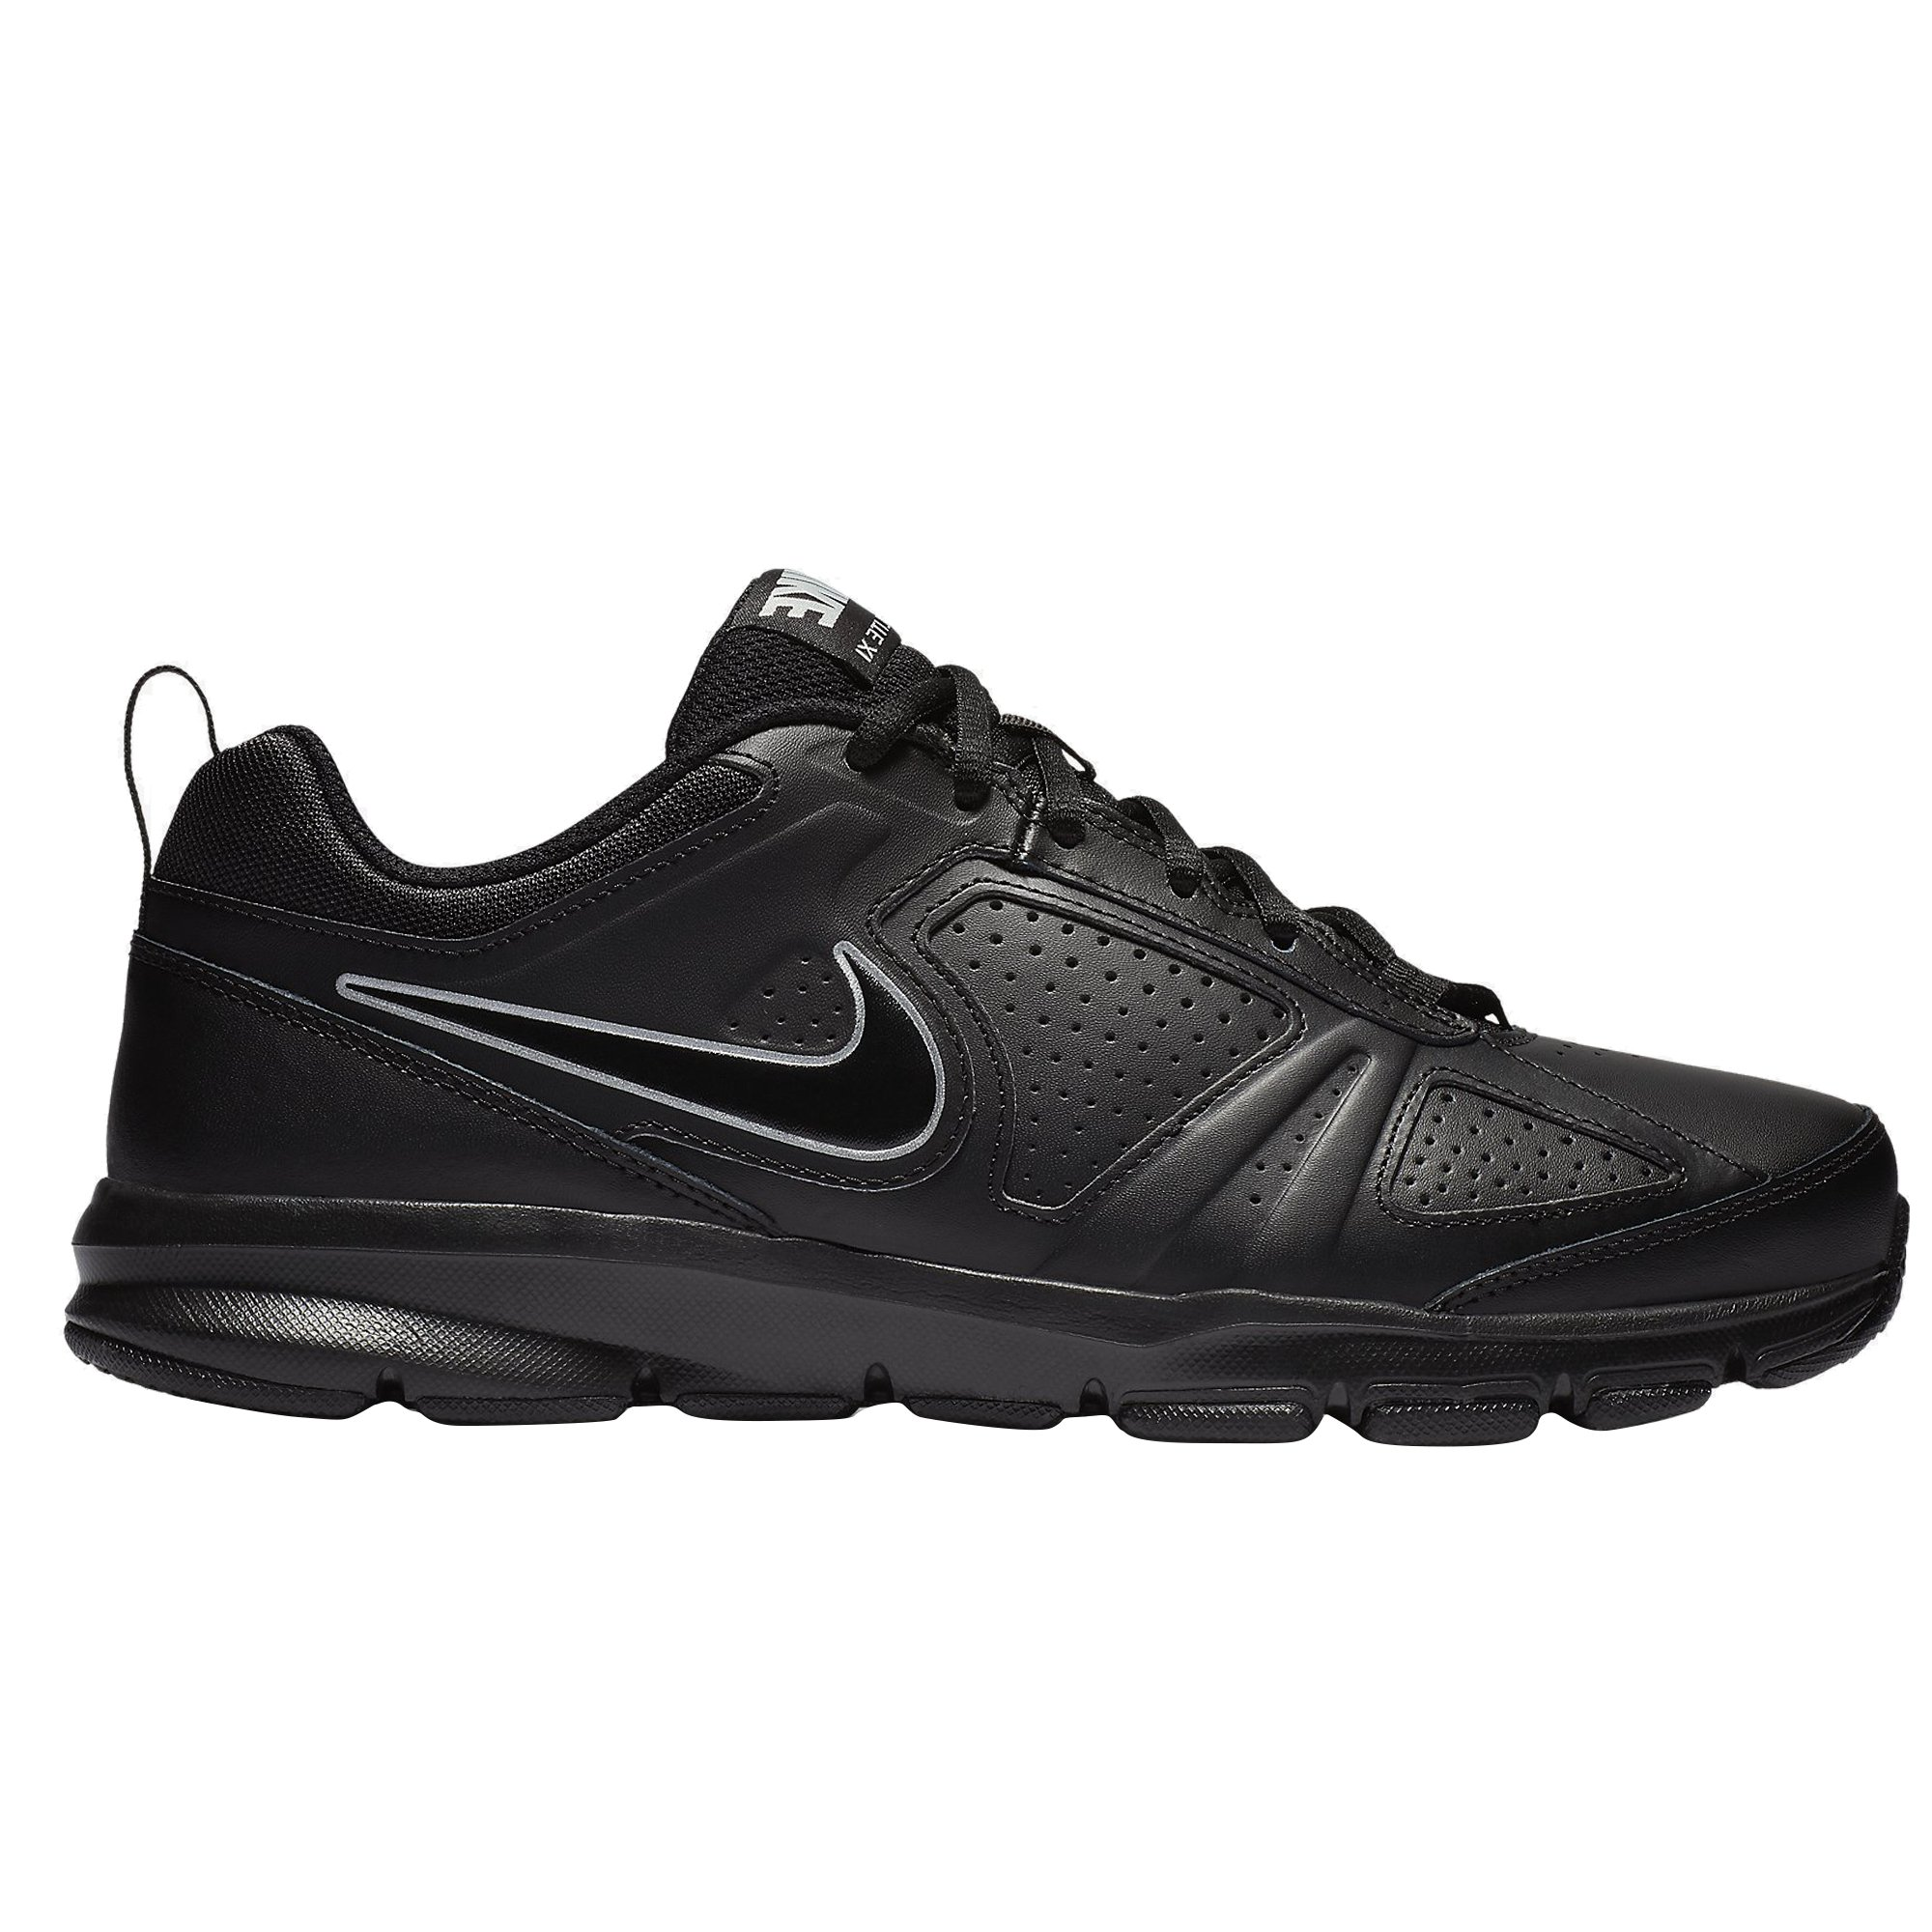 Continuamente Petrificar escaramuza  Nike T-Lite XI CO Erkek Spor Ayakkabı 616544-007 | Barçın